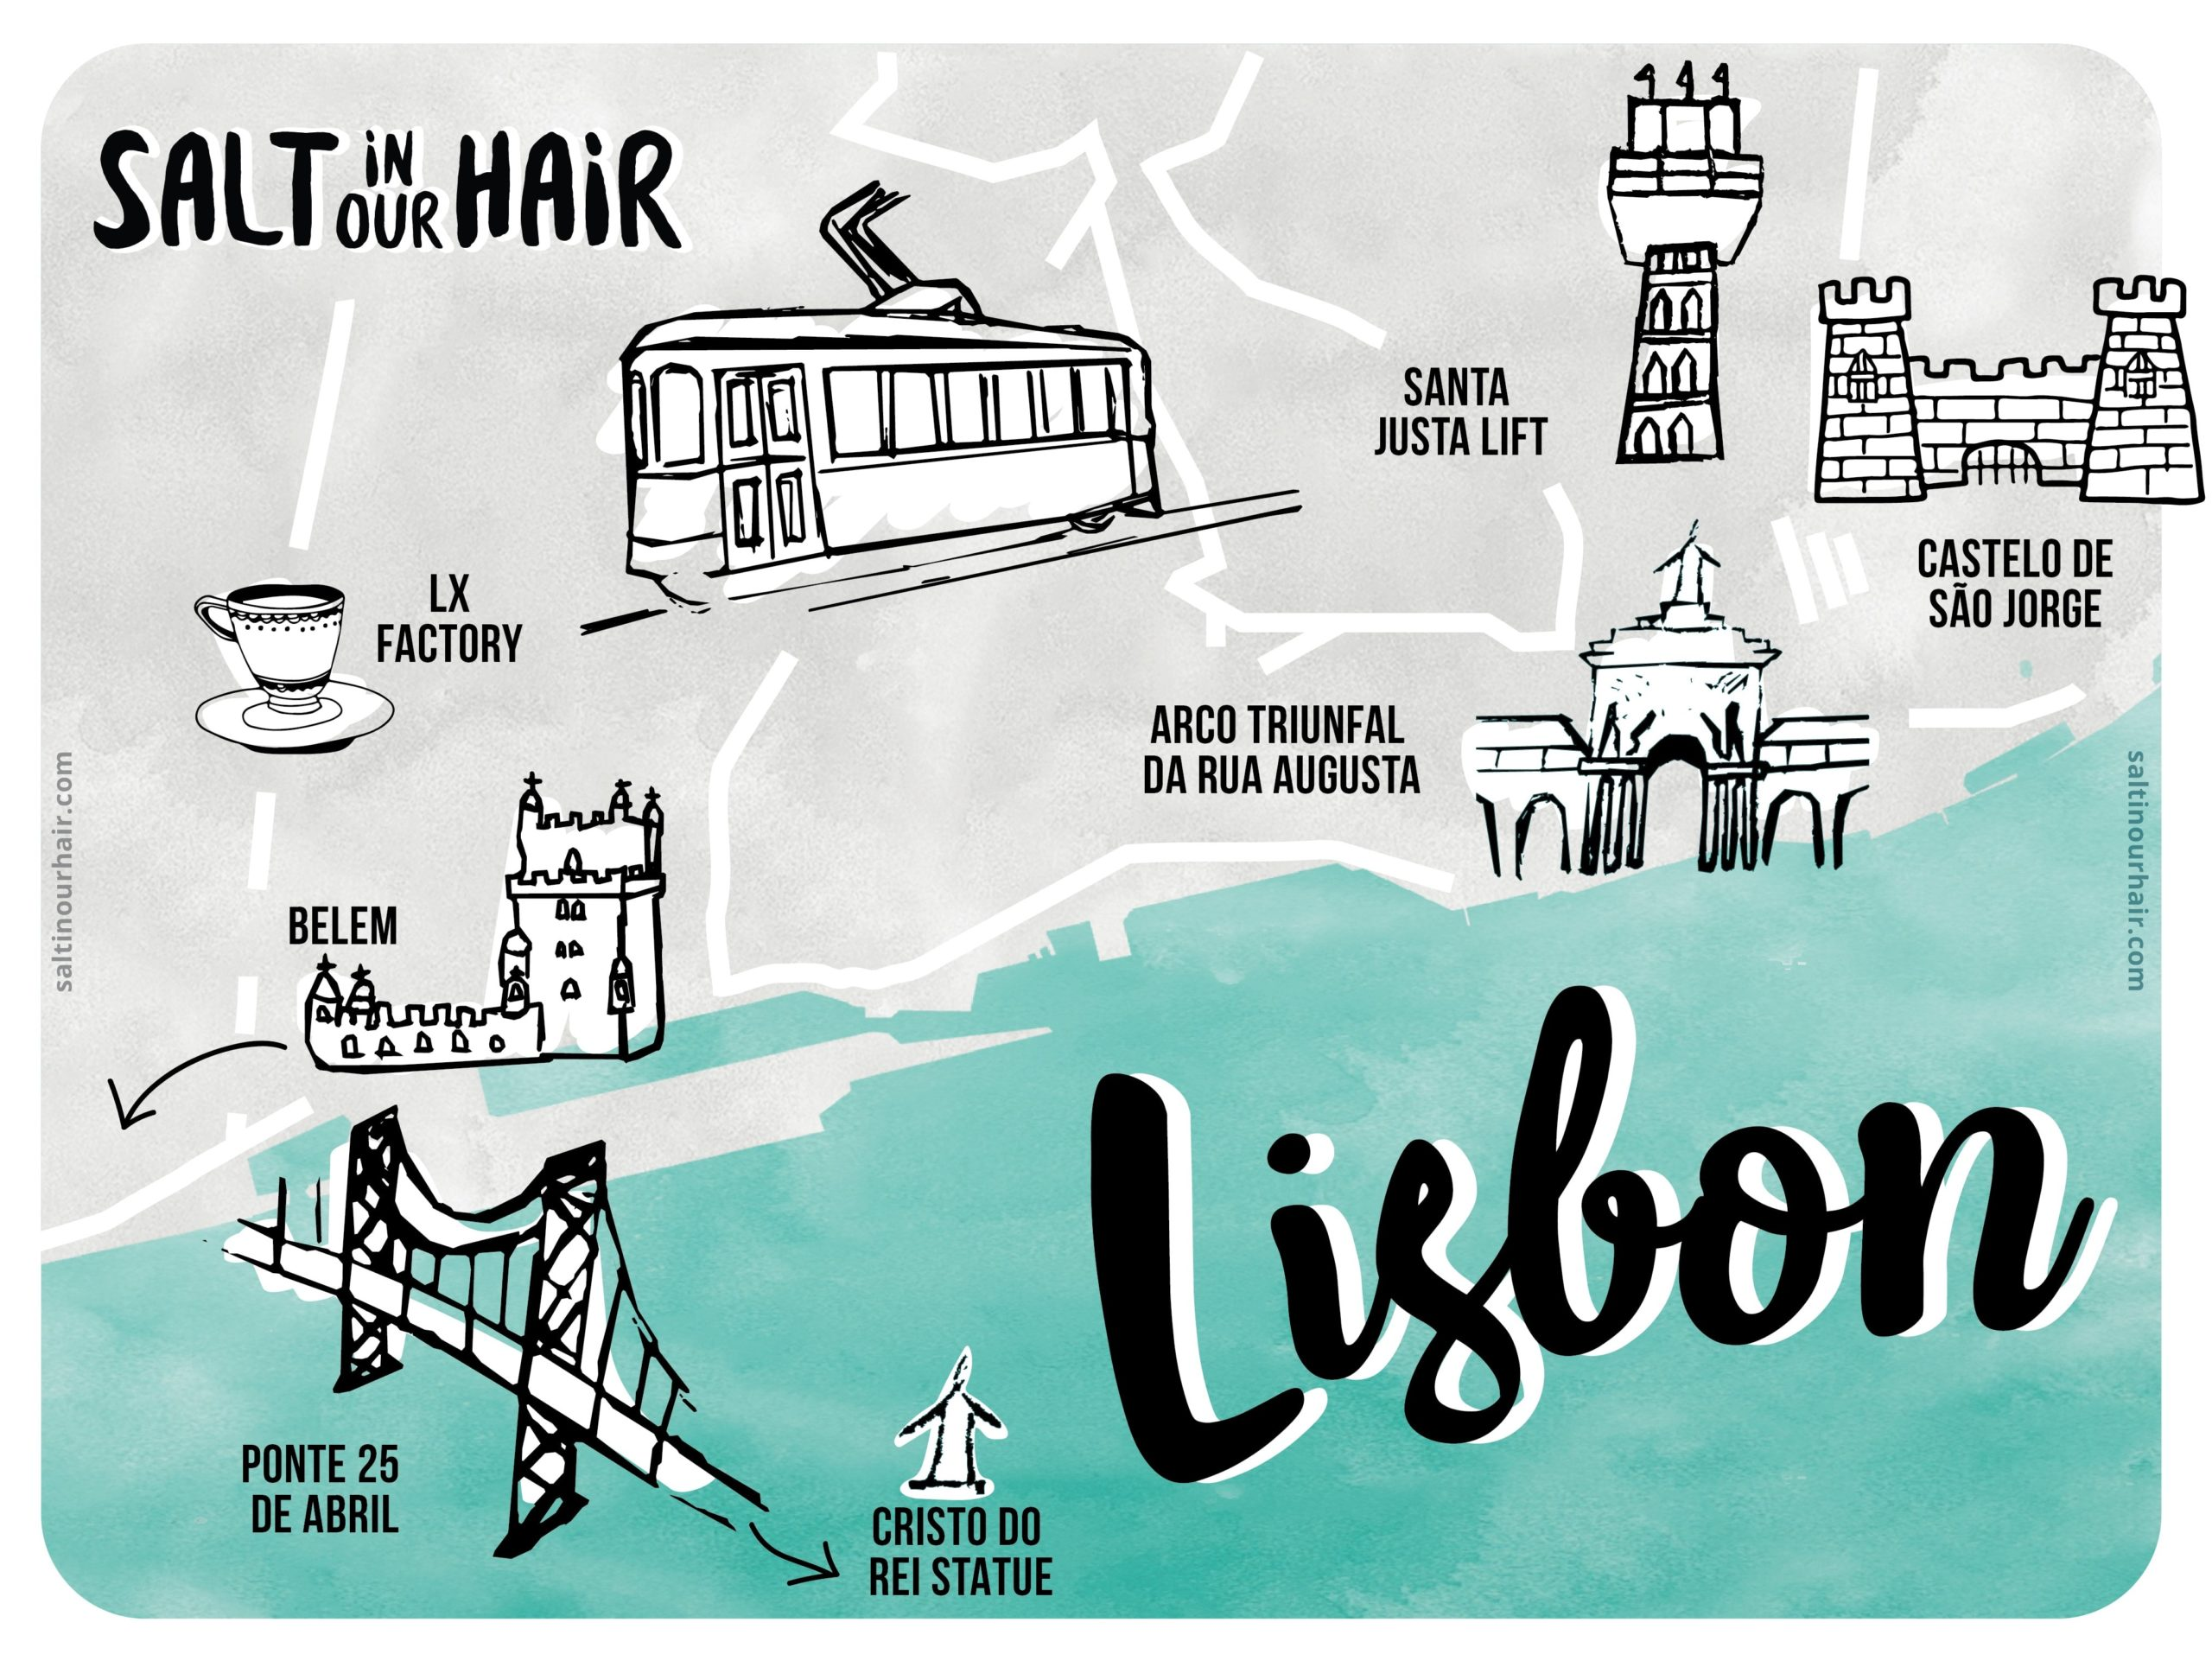 bezienswaardigheden lissabon kaart portugal